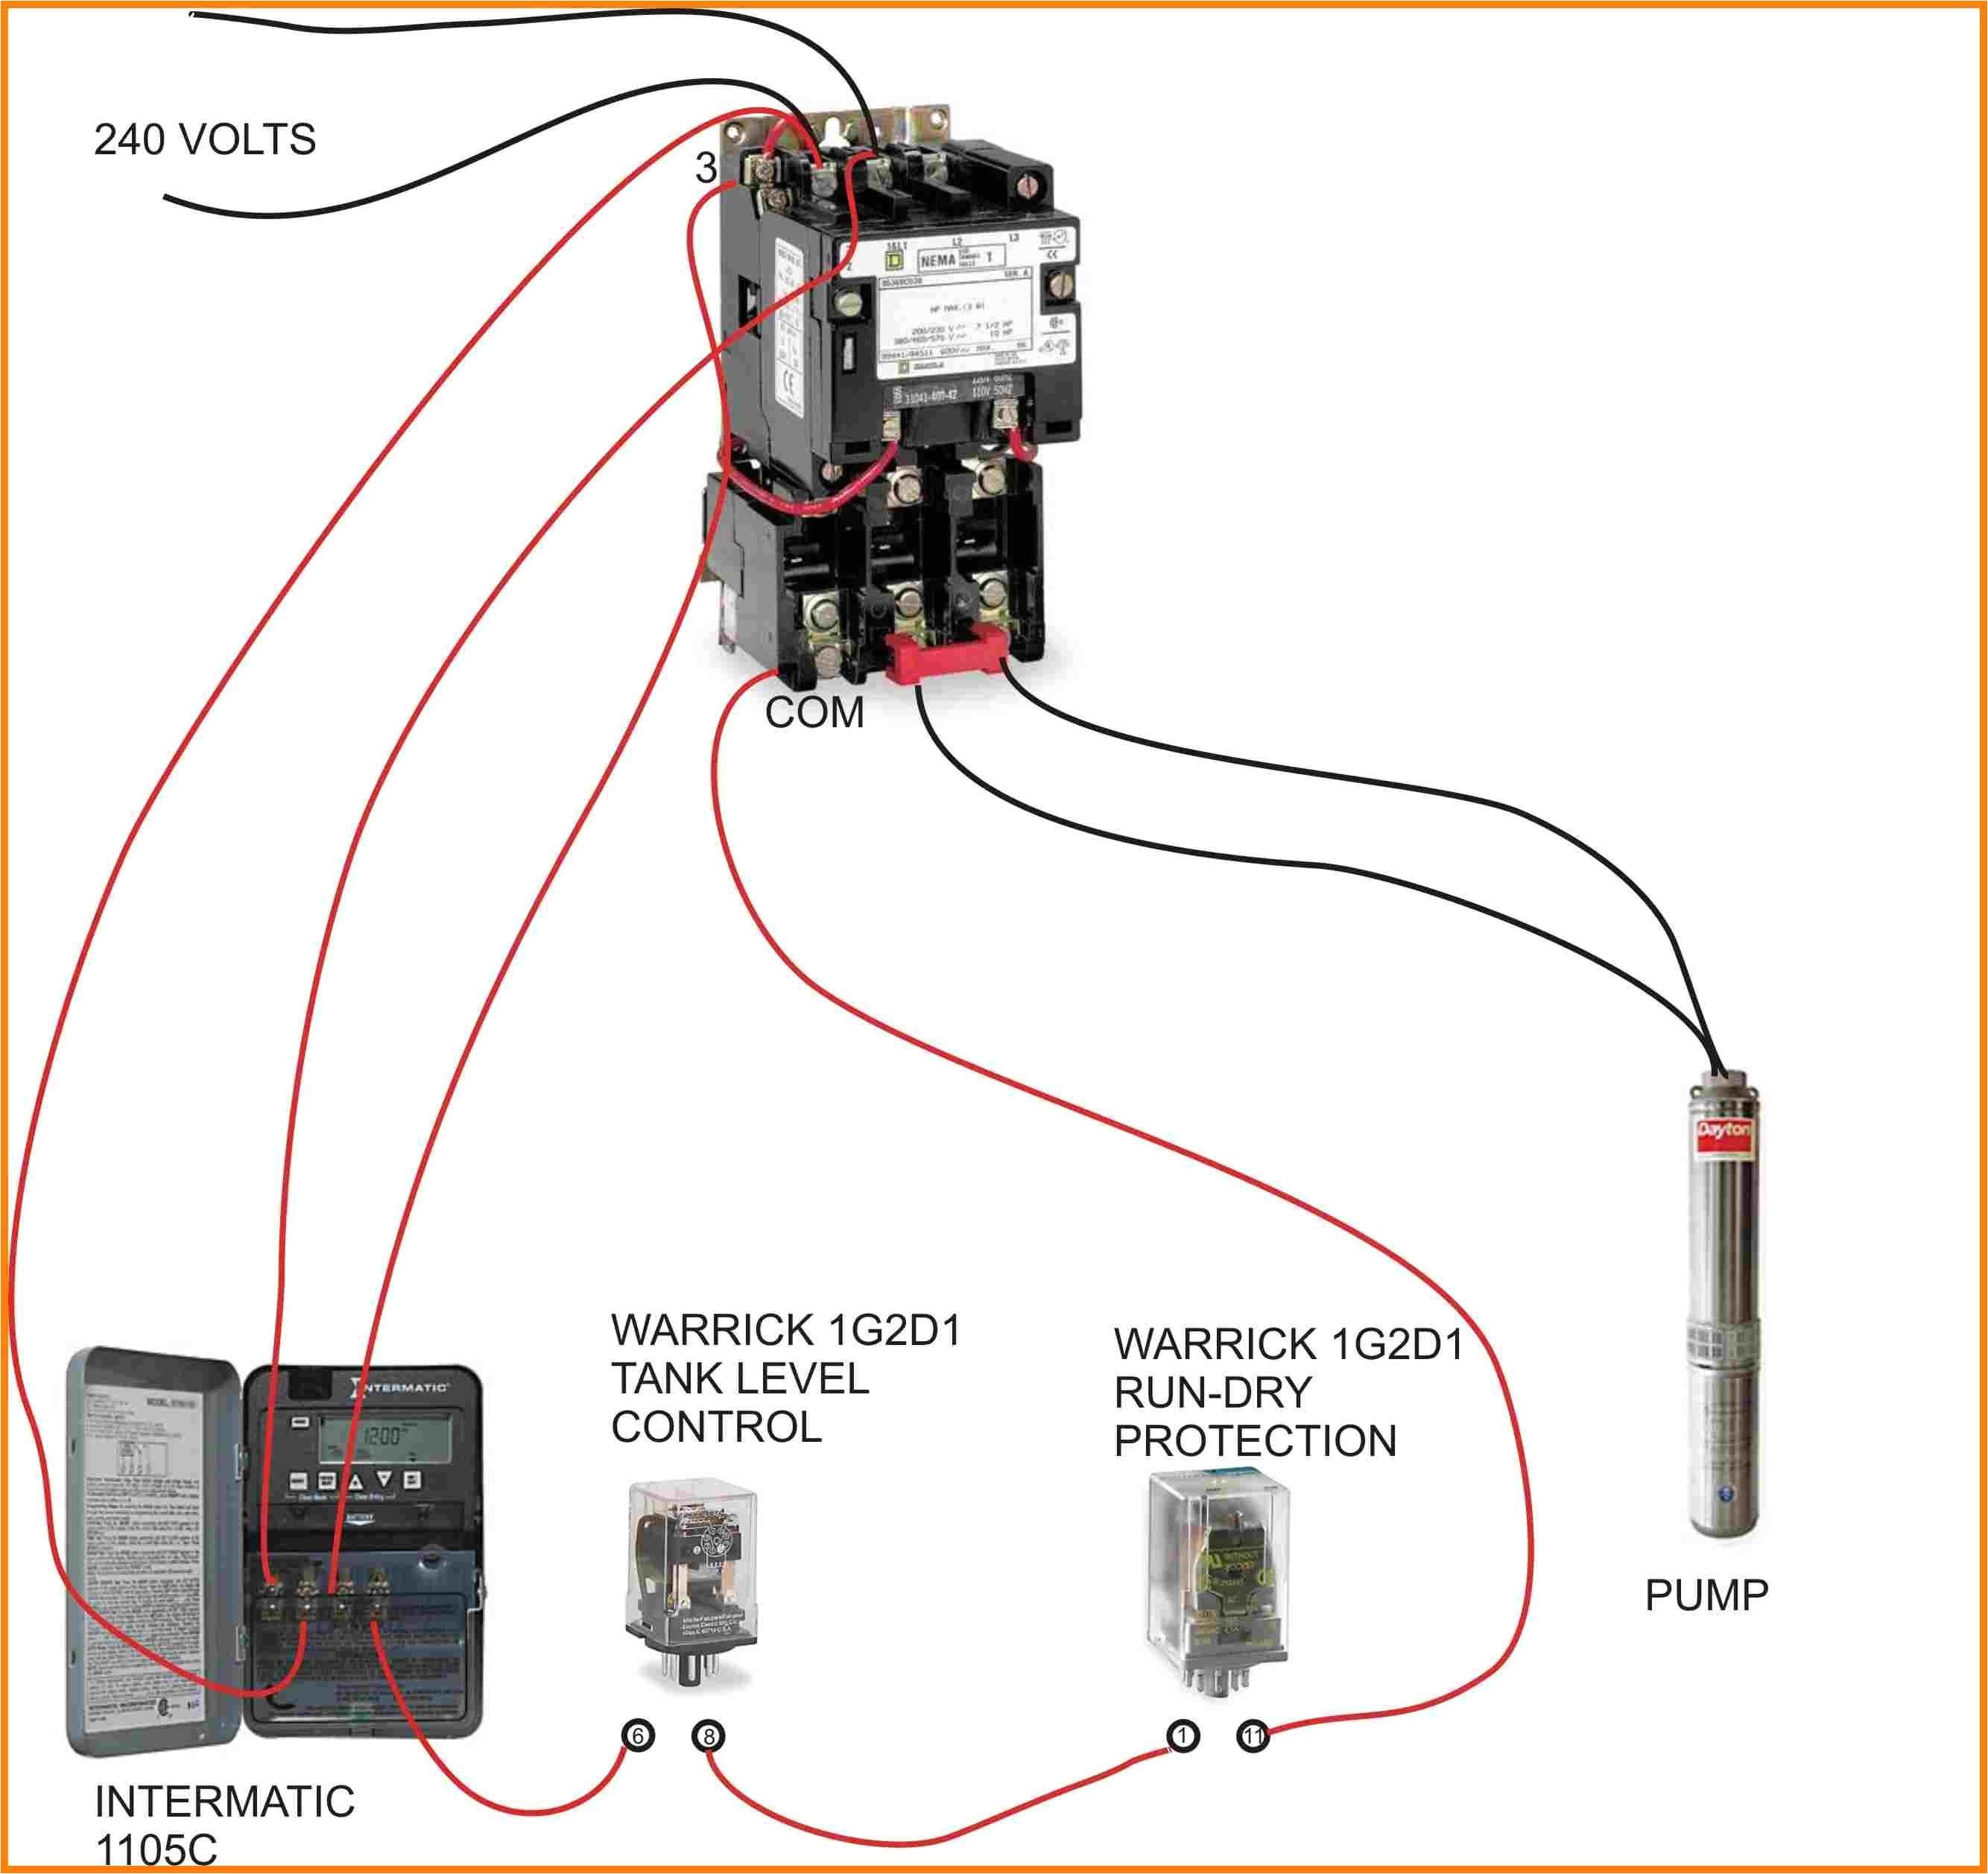 24 Volt Contactor Wiring Diagram Ac Contactor Wiring Wiring Diagram Expert